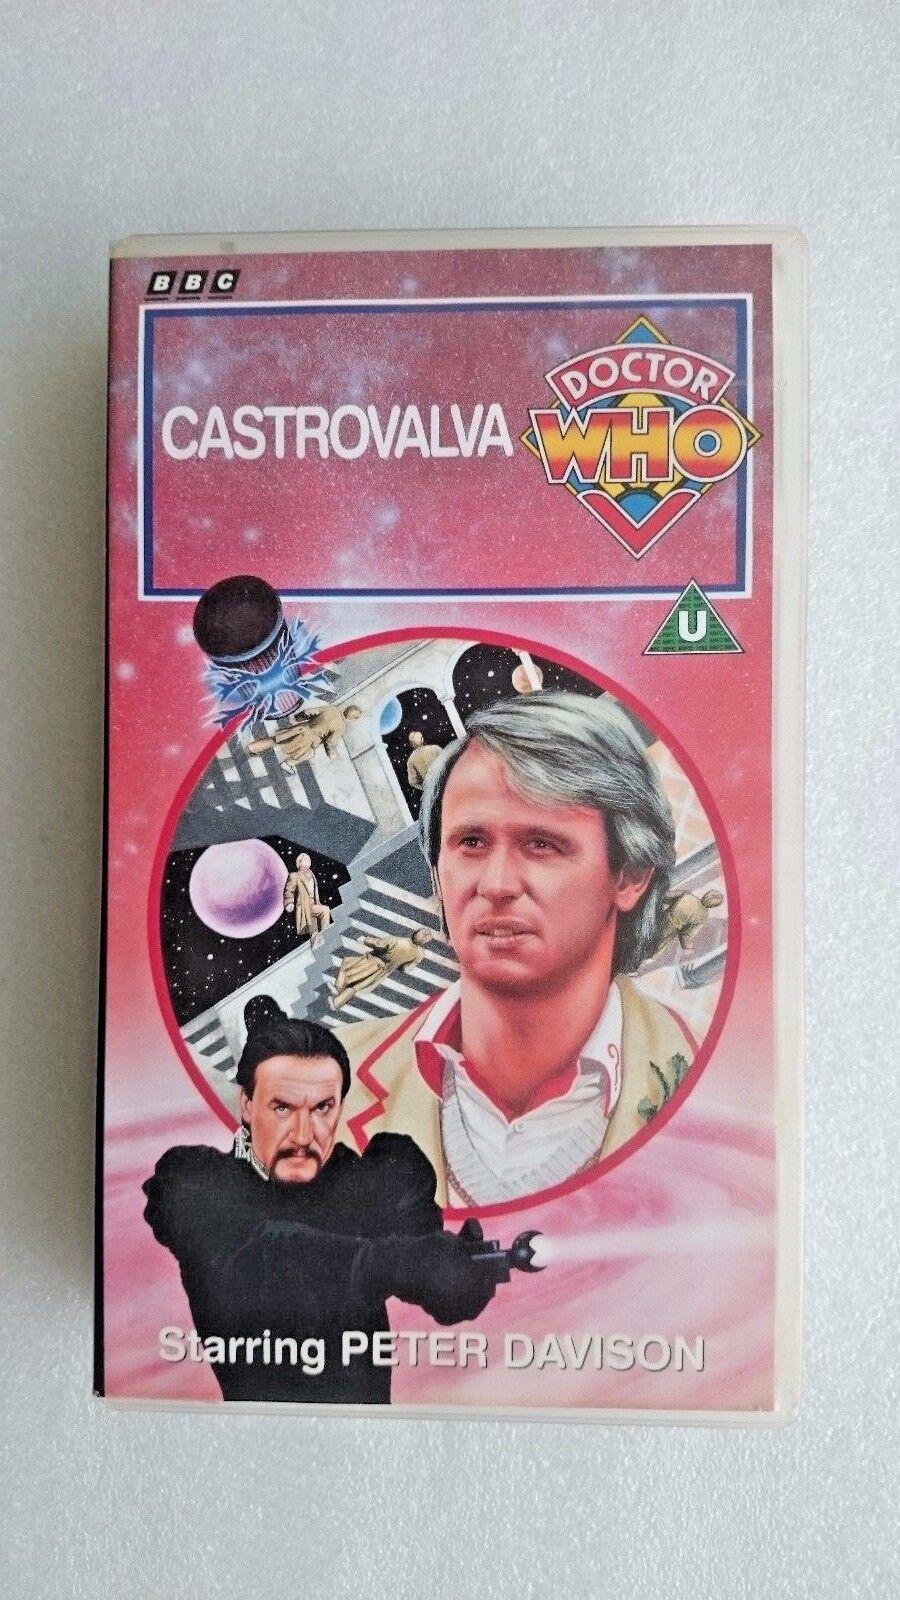 Doctor Who - Castrovalva (VHS/H, 1992)